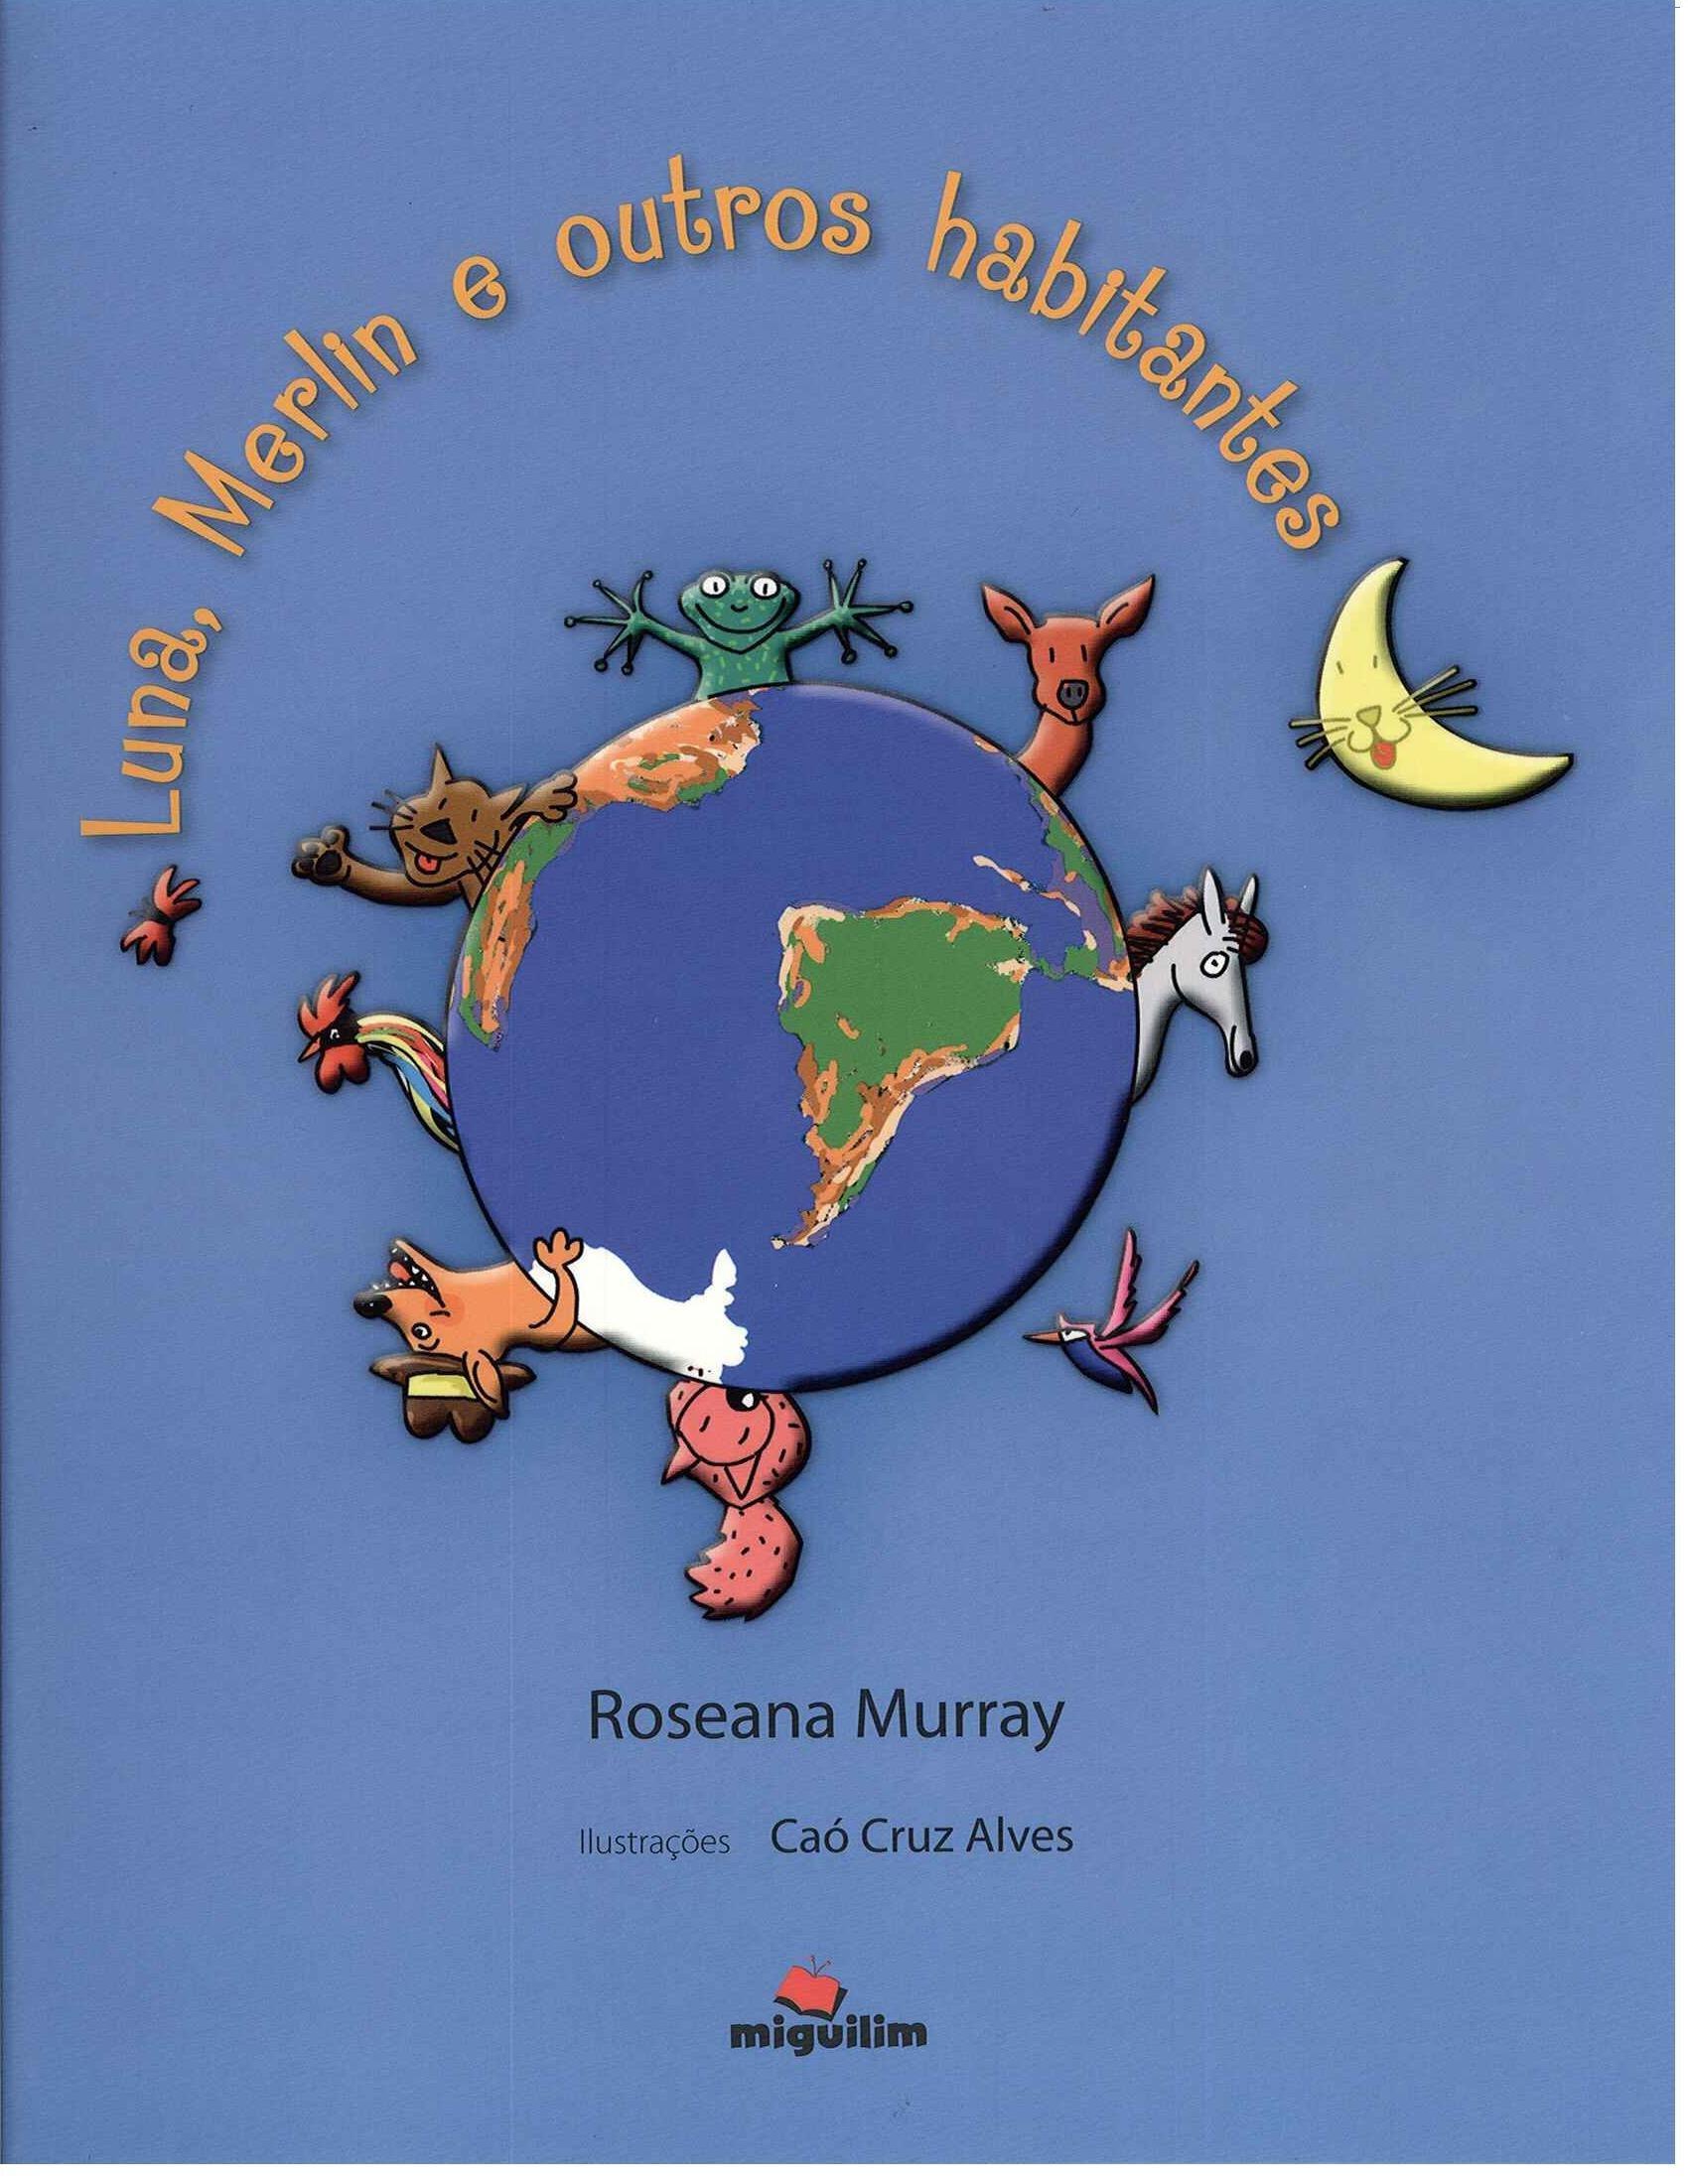 Luna, Merlin e Outros Habitantes (Portuguese Brazilian) Paperback – 2011